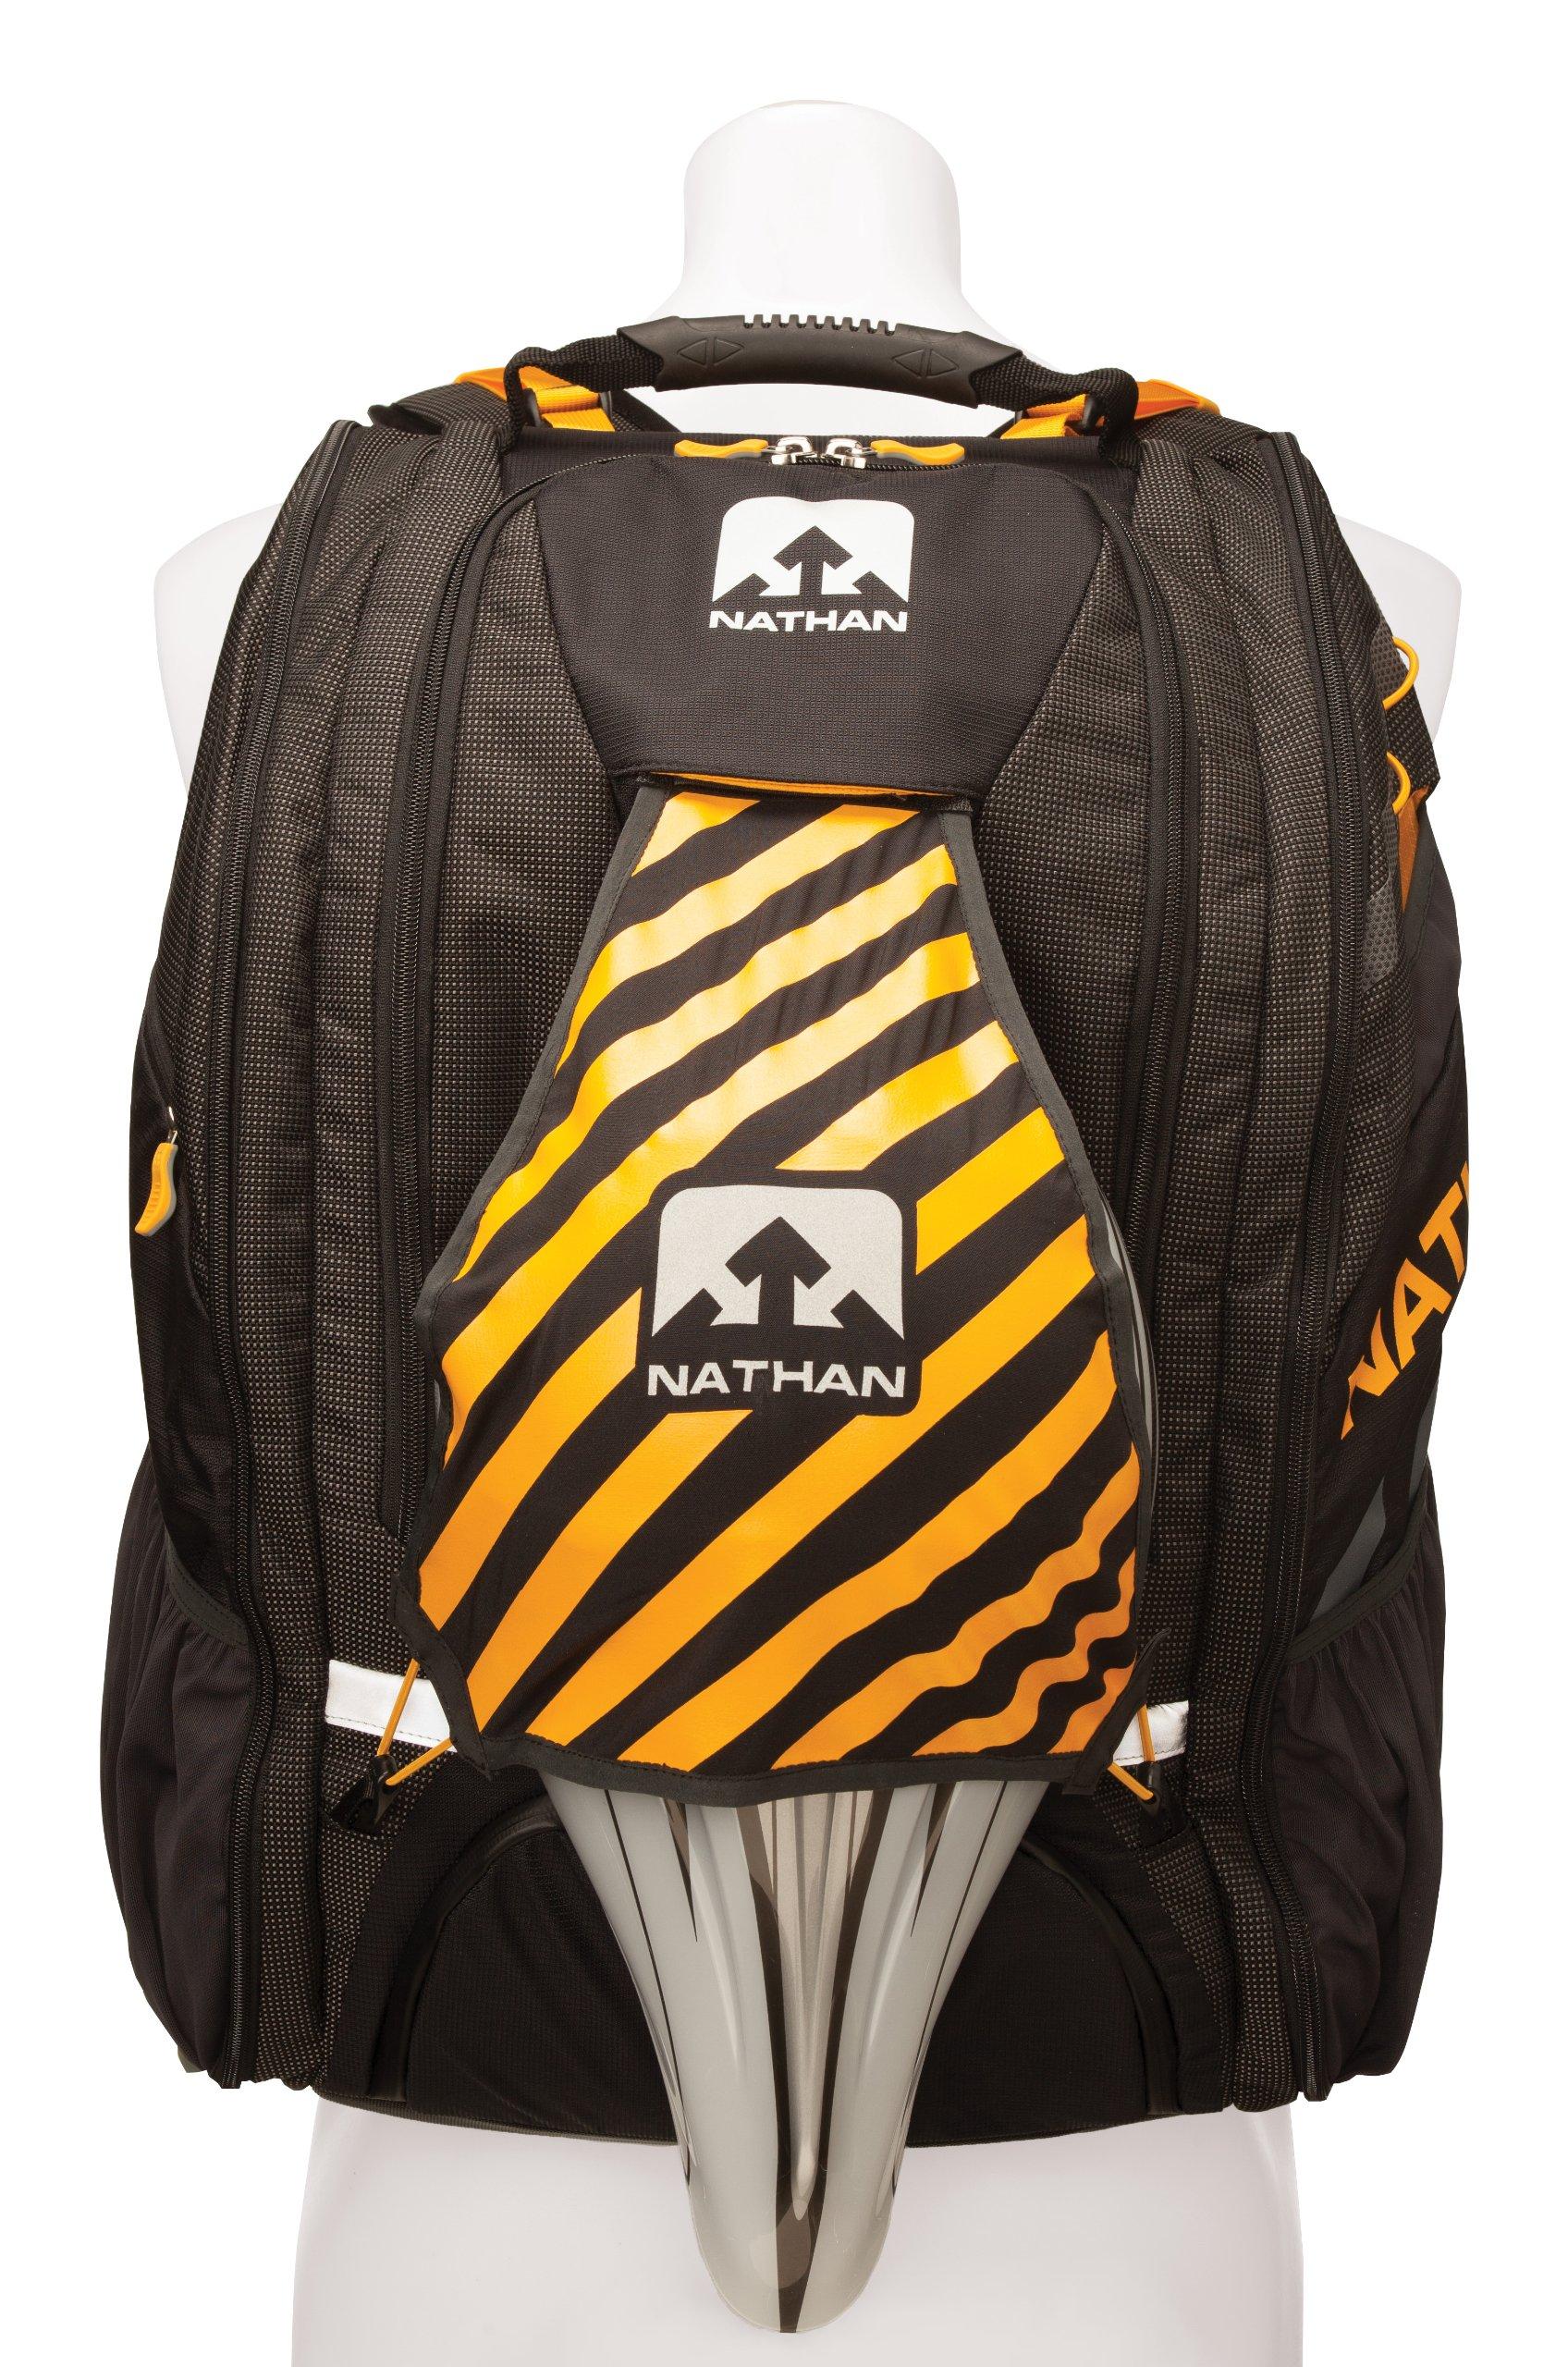 Nathan Mission Control Bag, Black by Nathan (Image #3)